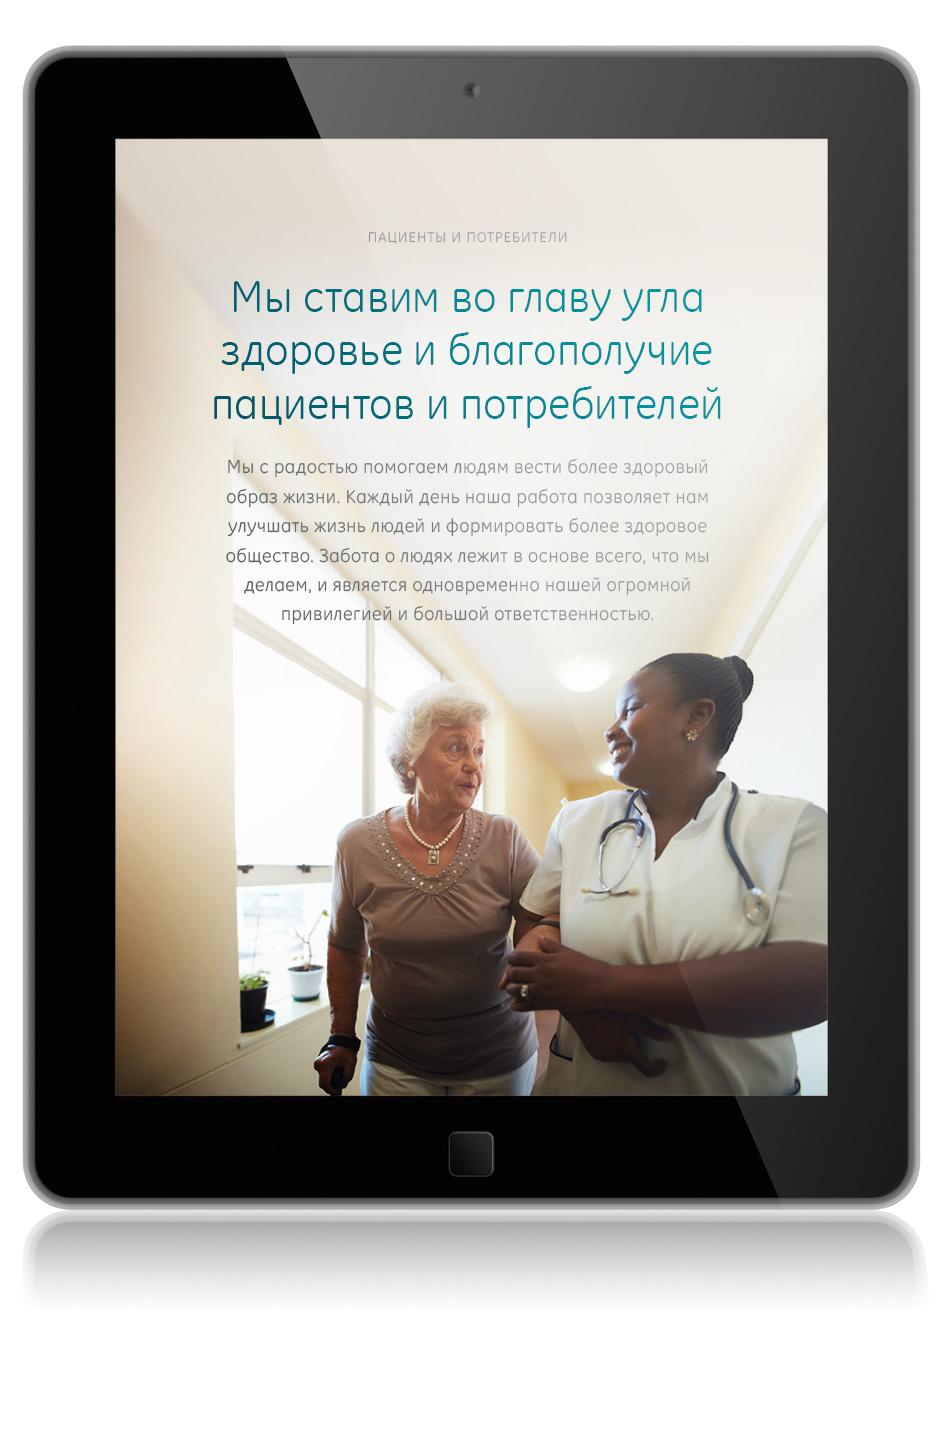 OurWork_Train75k_iPad_Russian.jpg